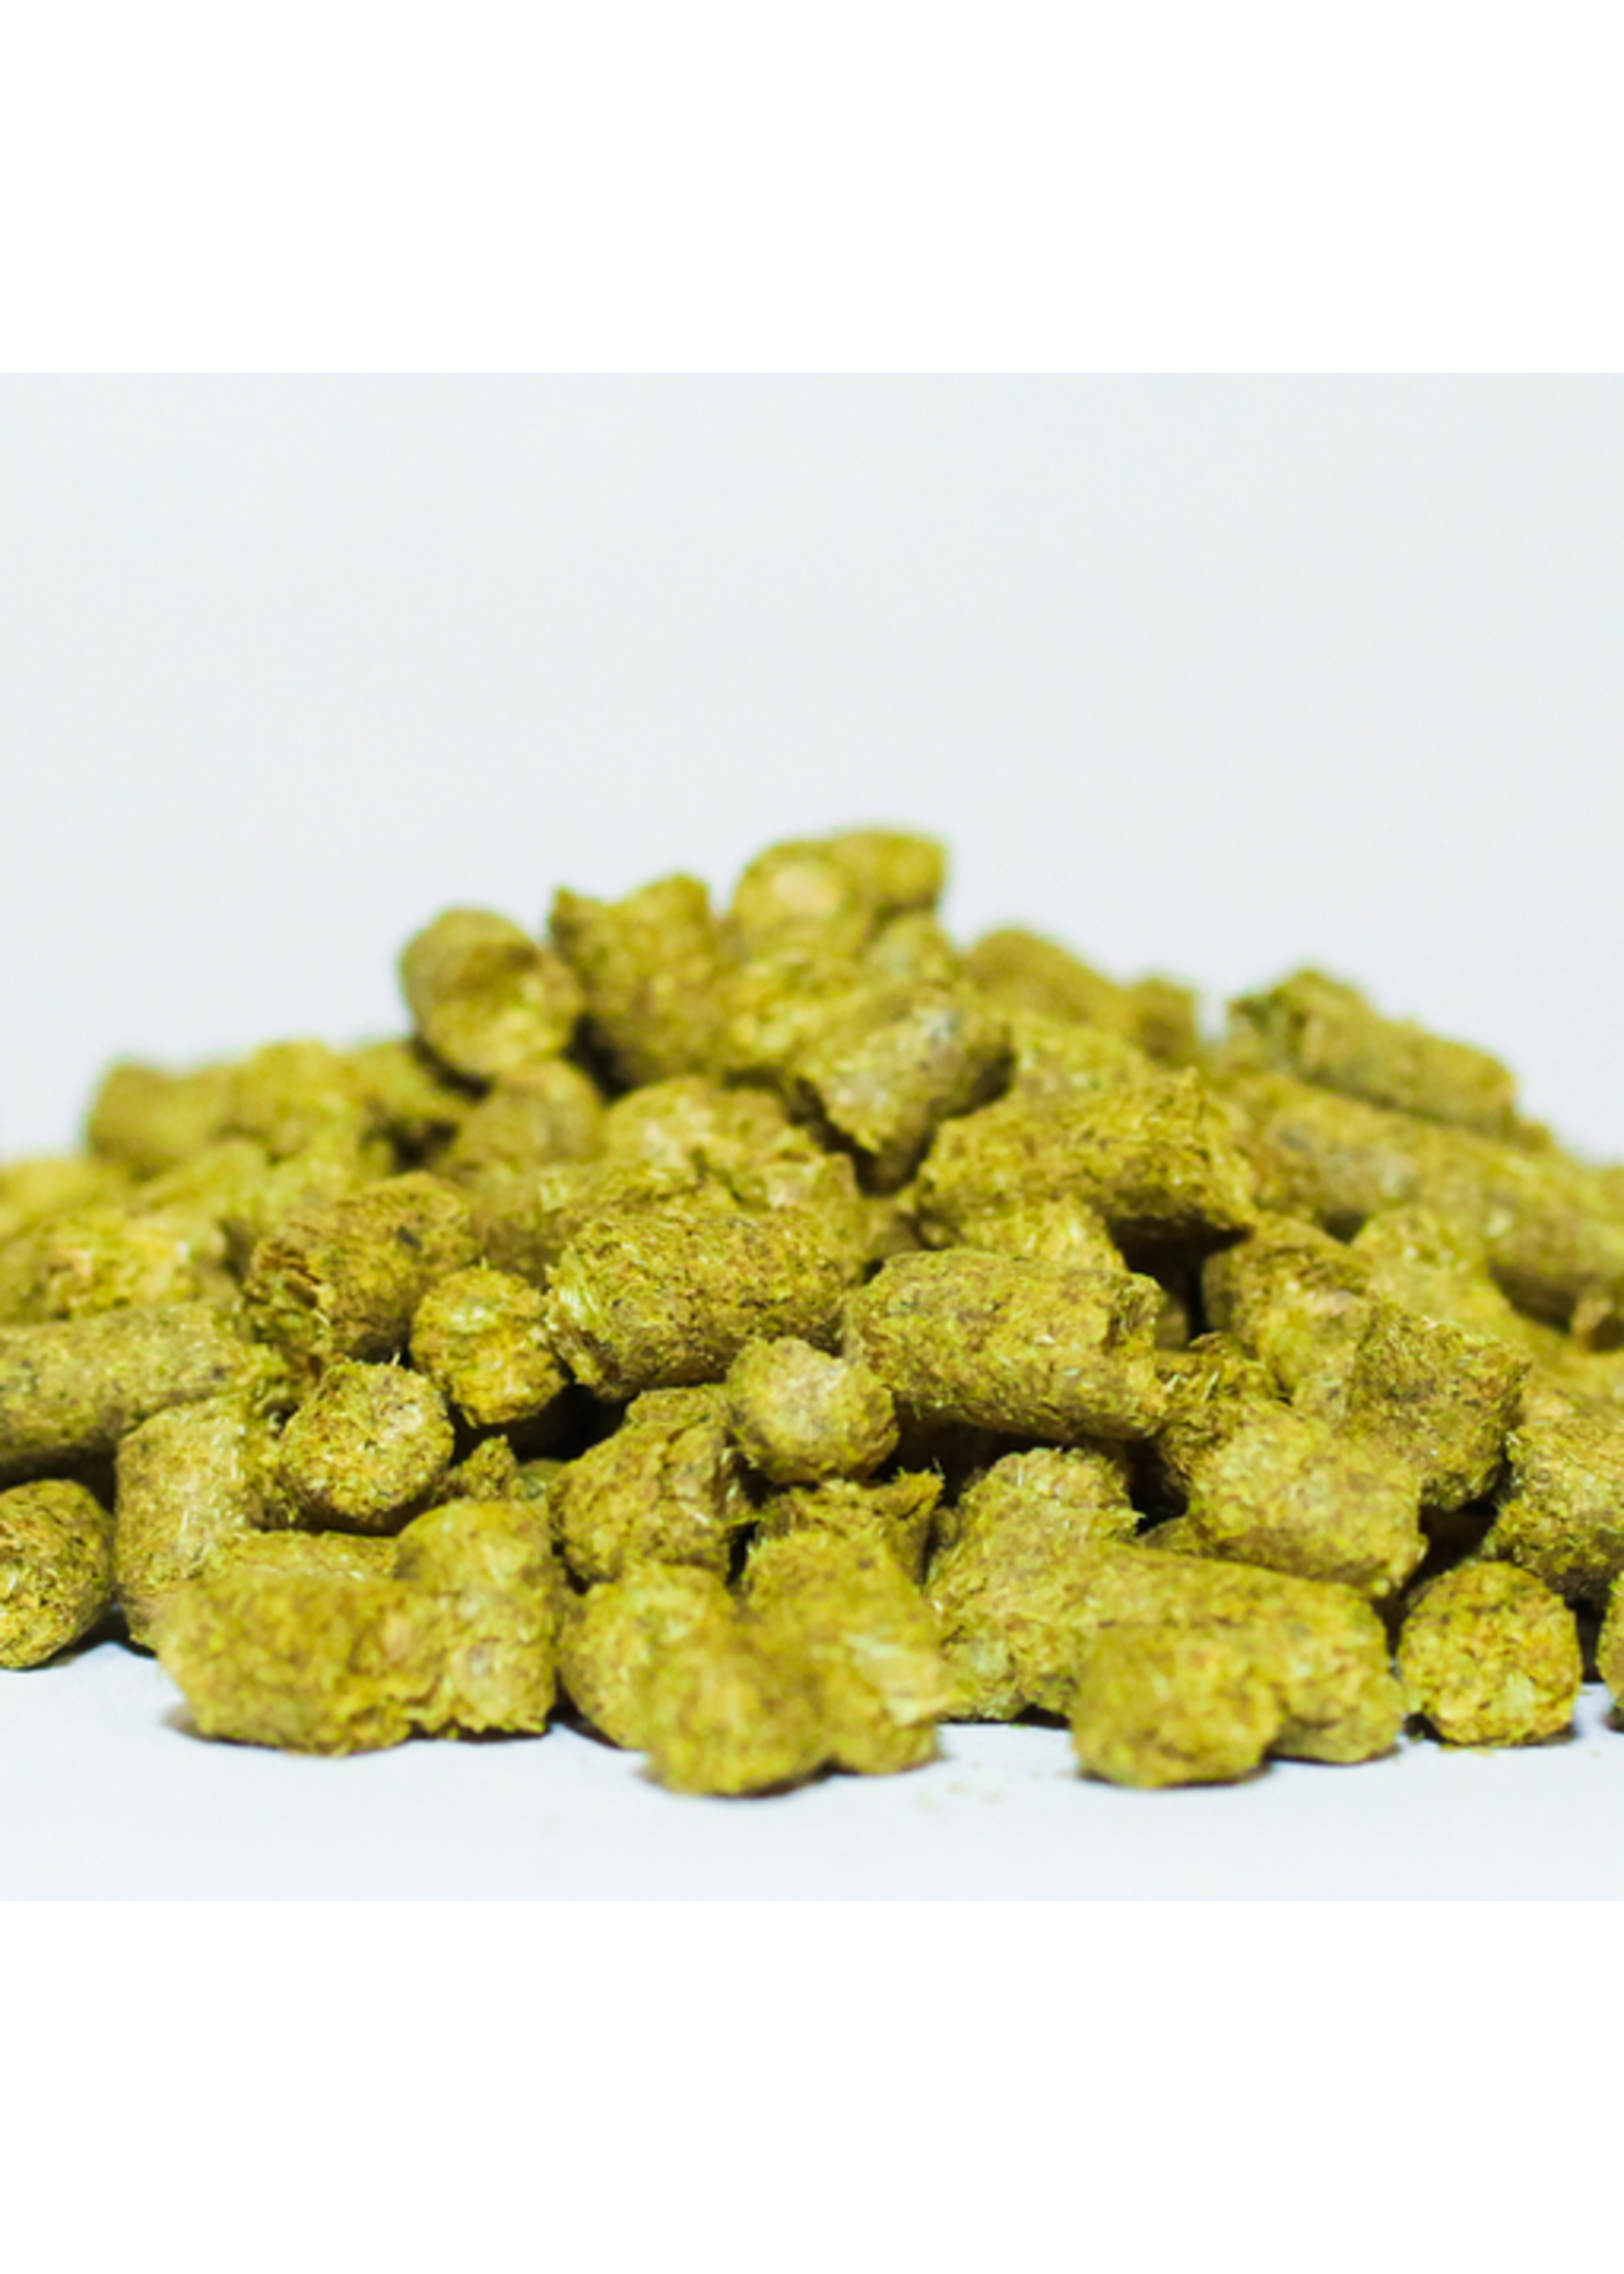 Hops Cashmere Hops (US) - Pellets - 1 oz